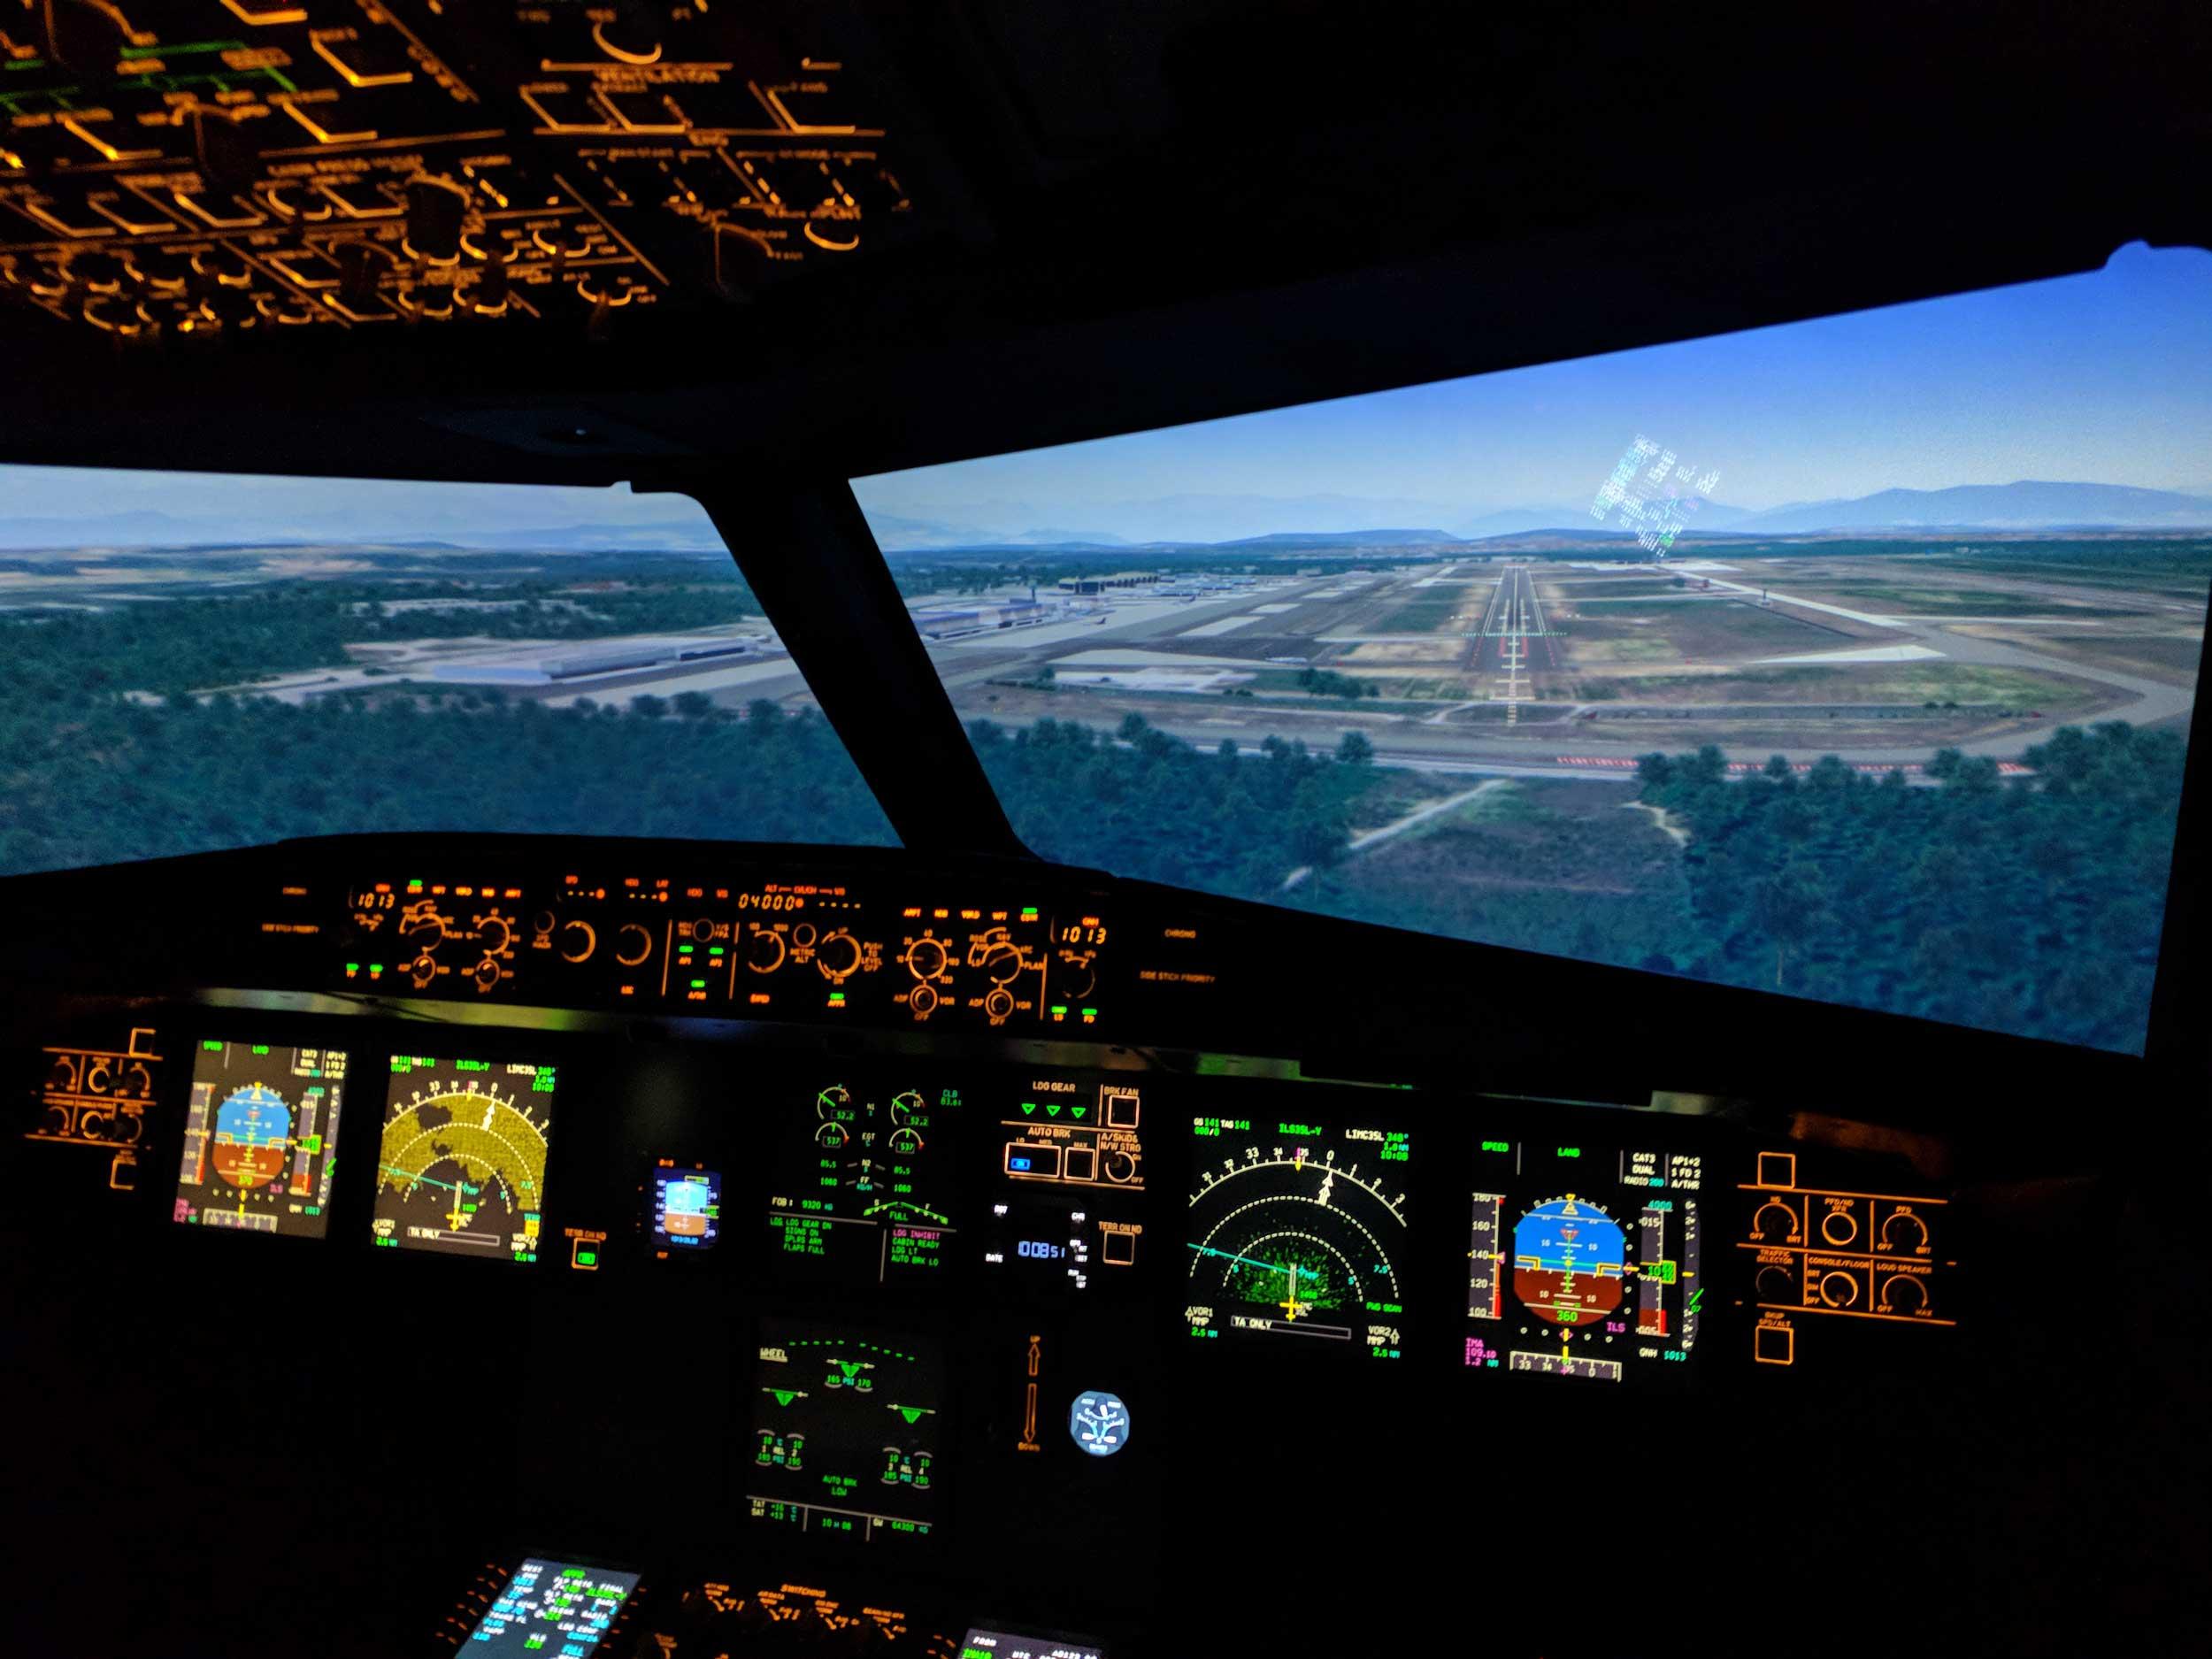 L3Harris Flight Training Devices